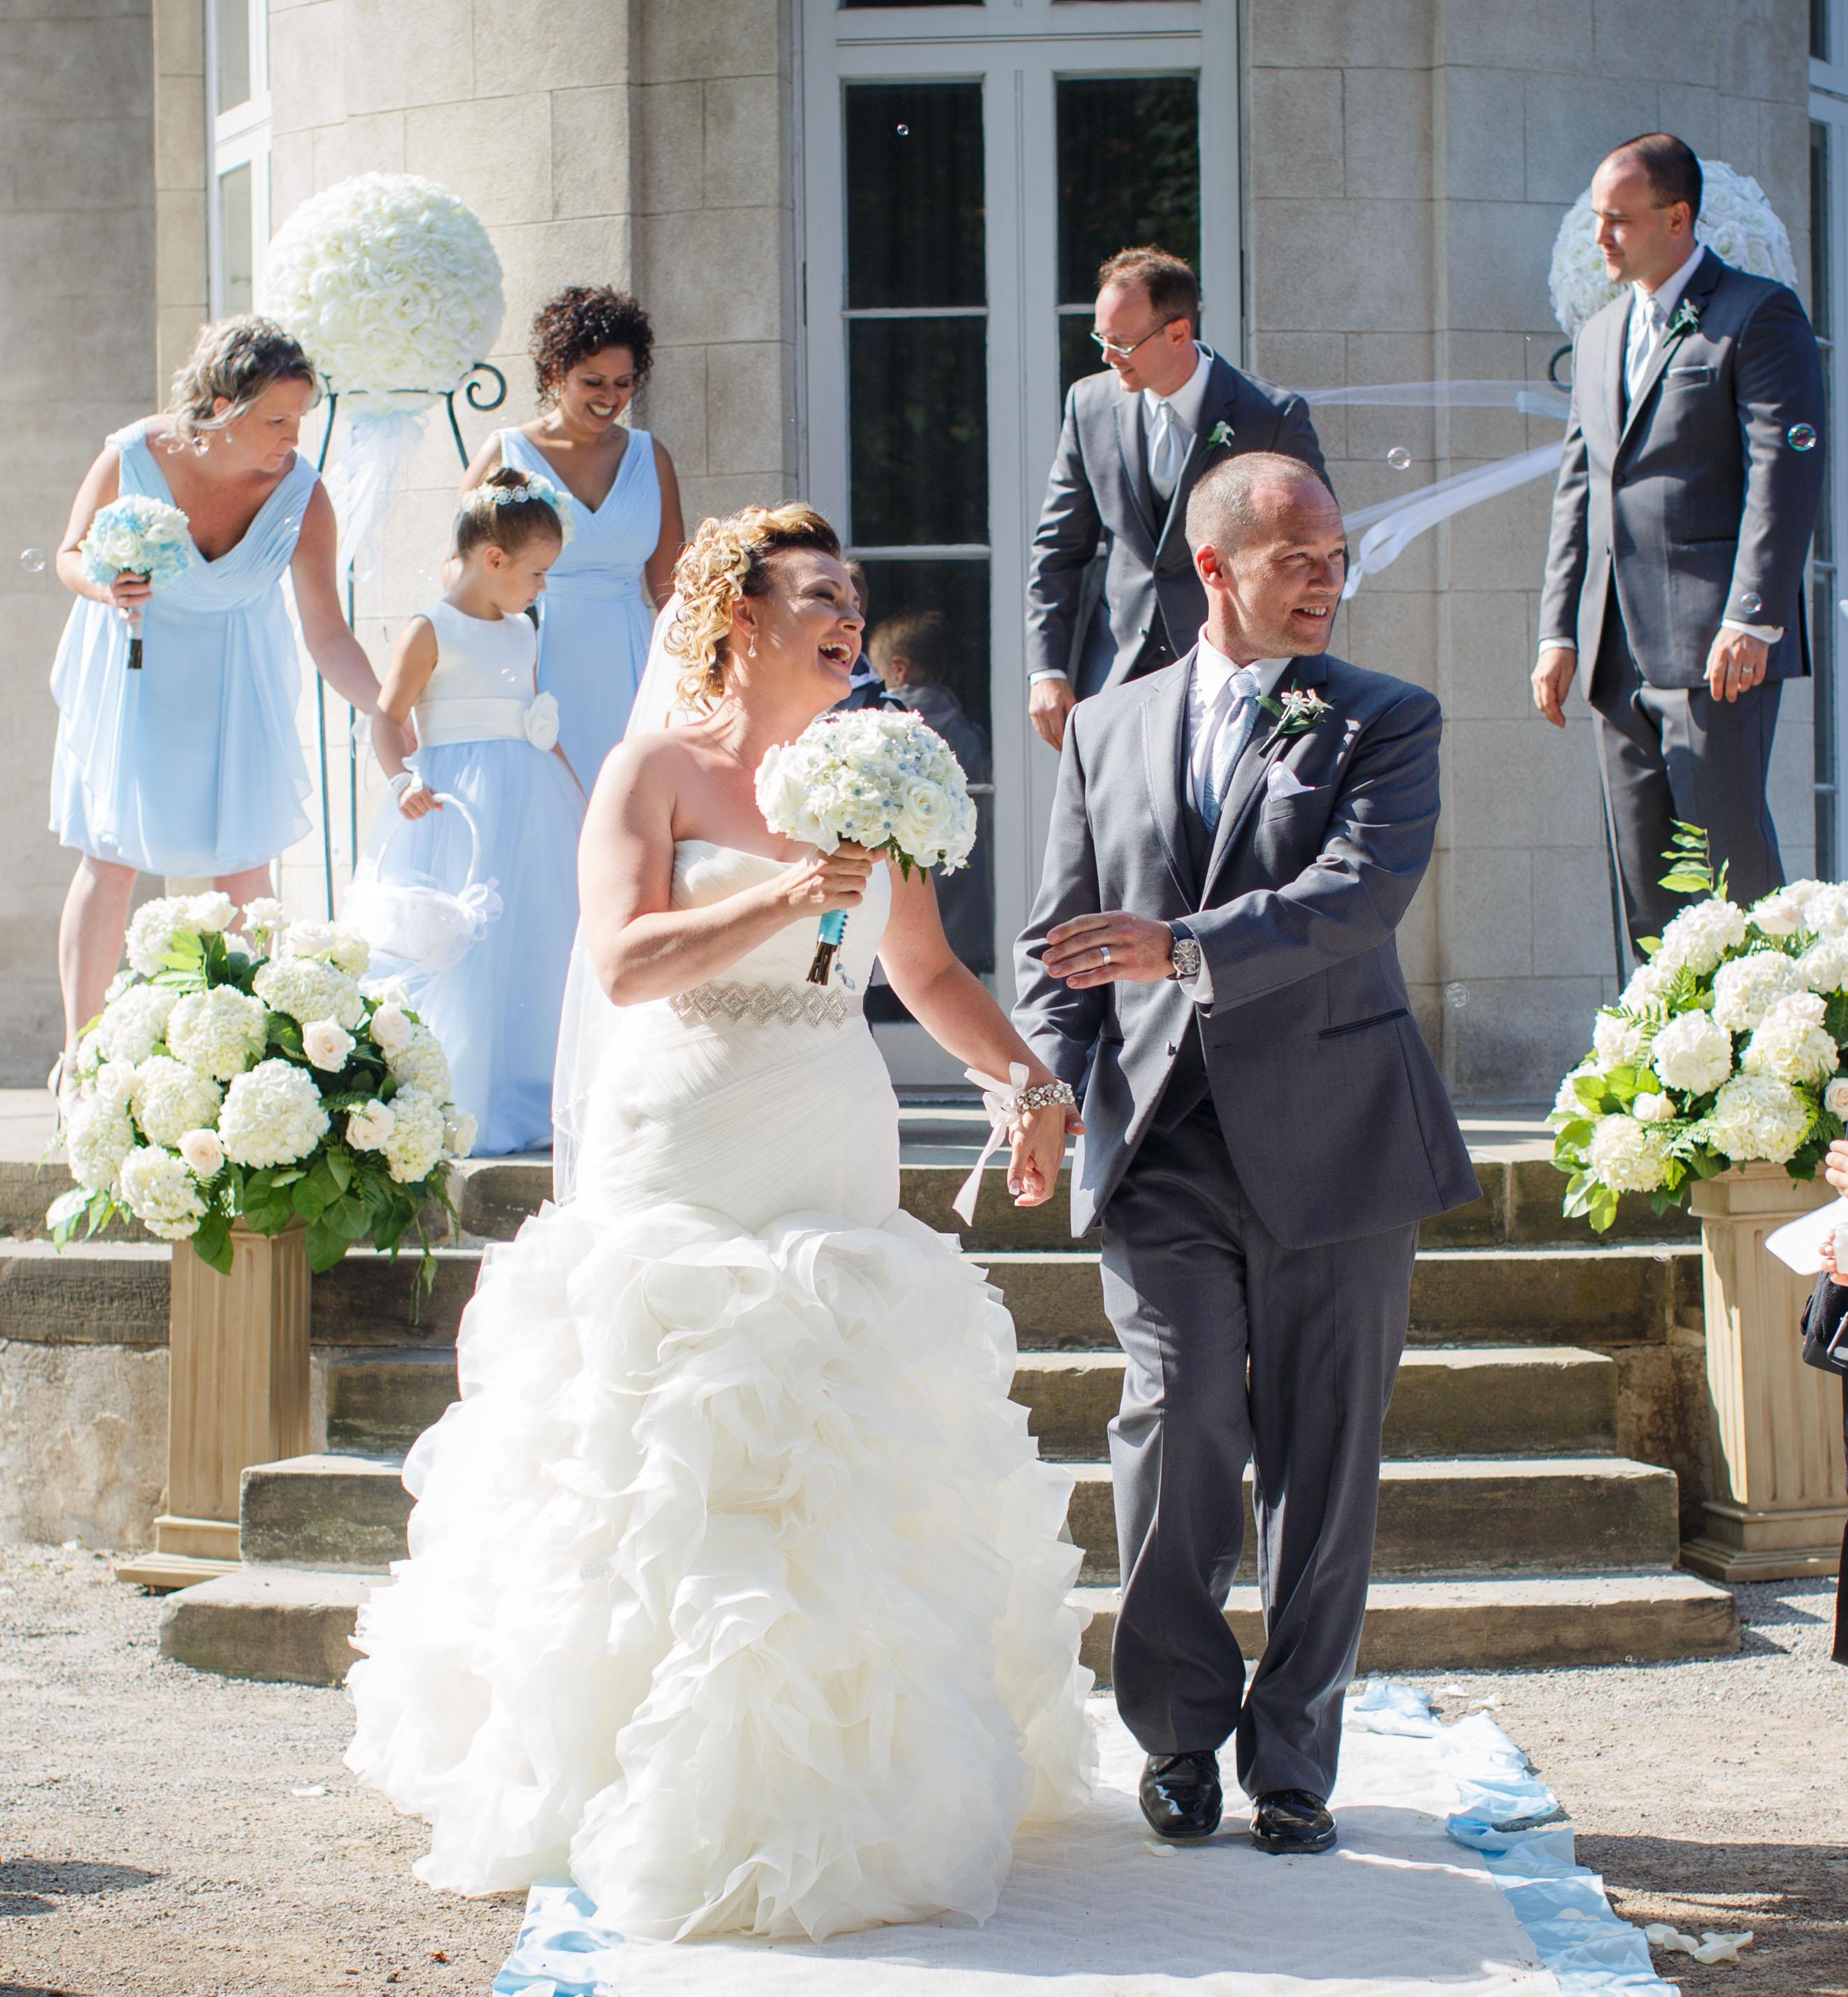 Outdoor Wedding Ceremony Mississauga: Heritage Weddings